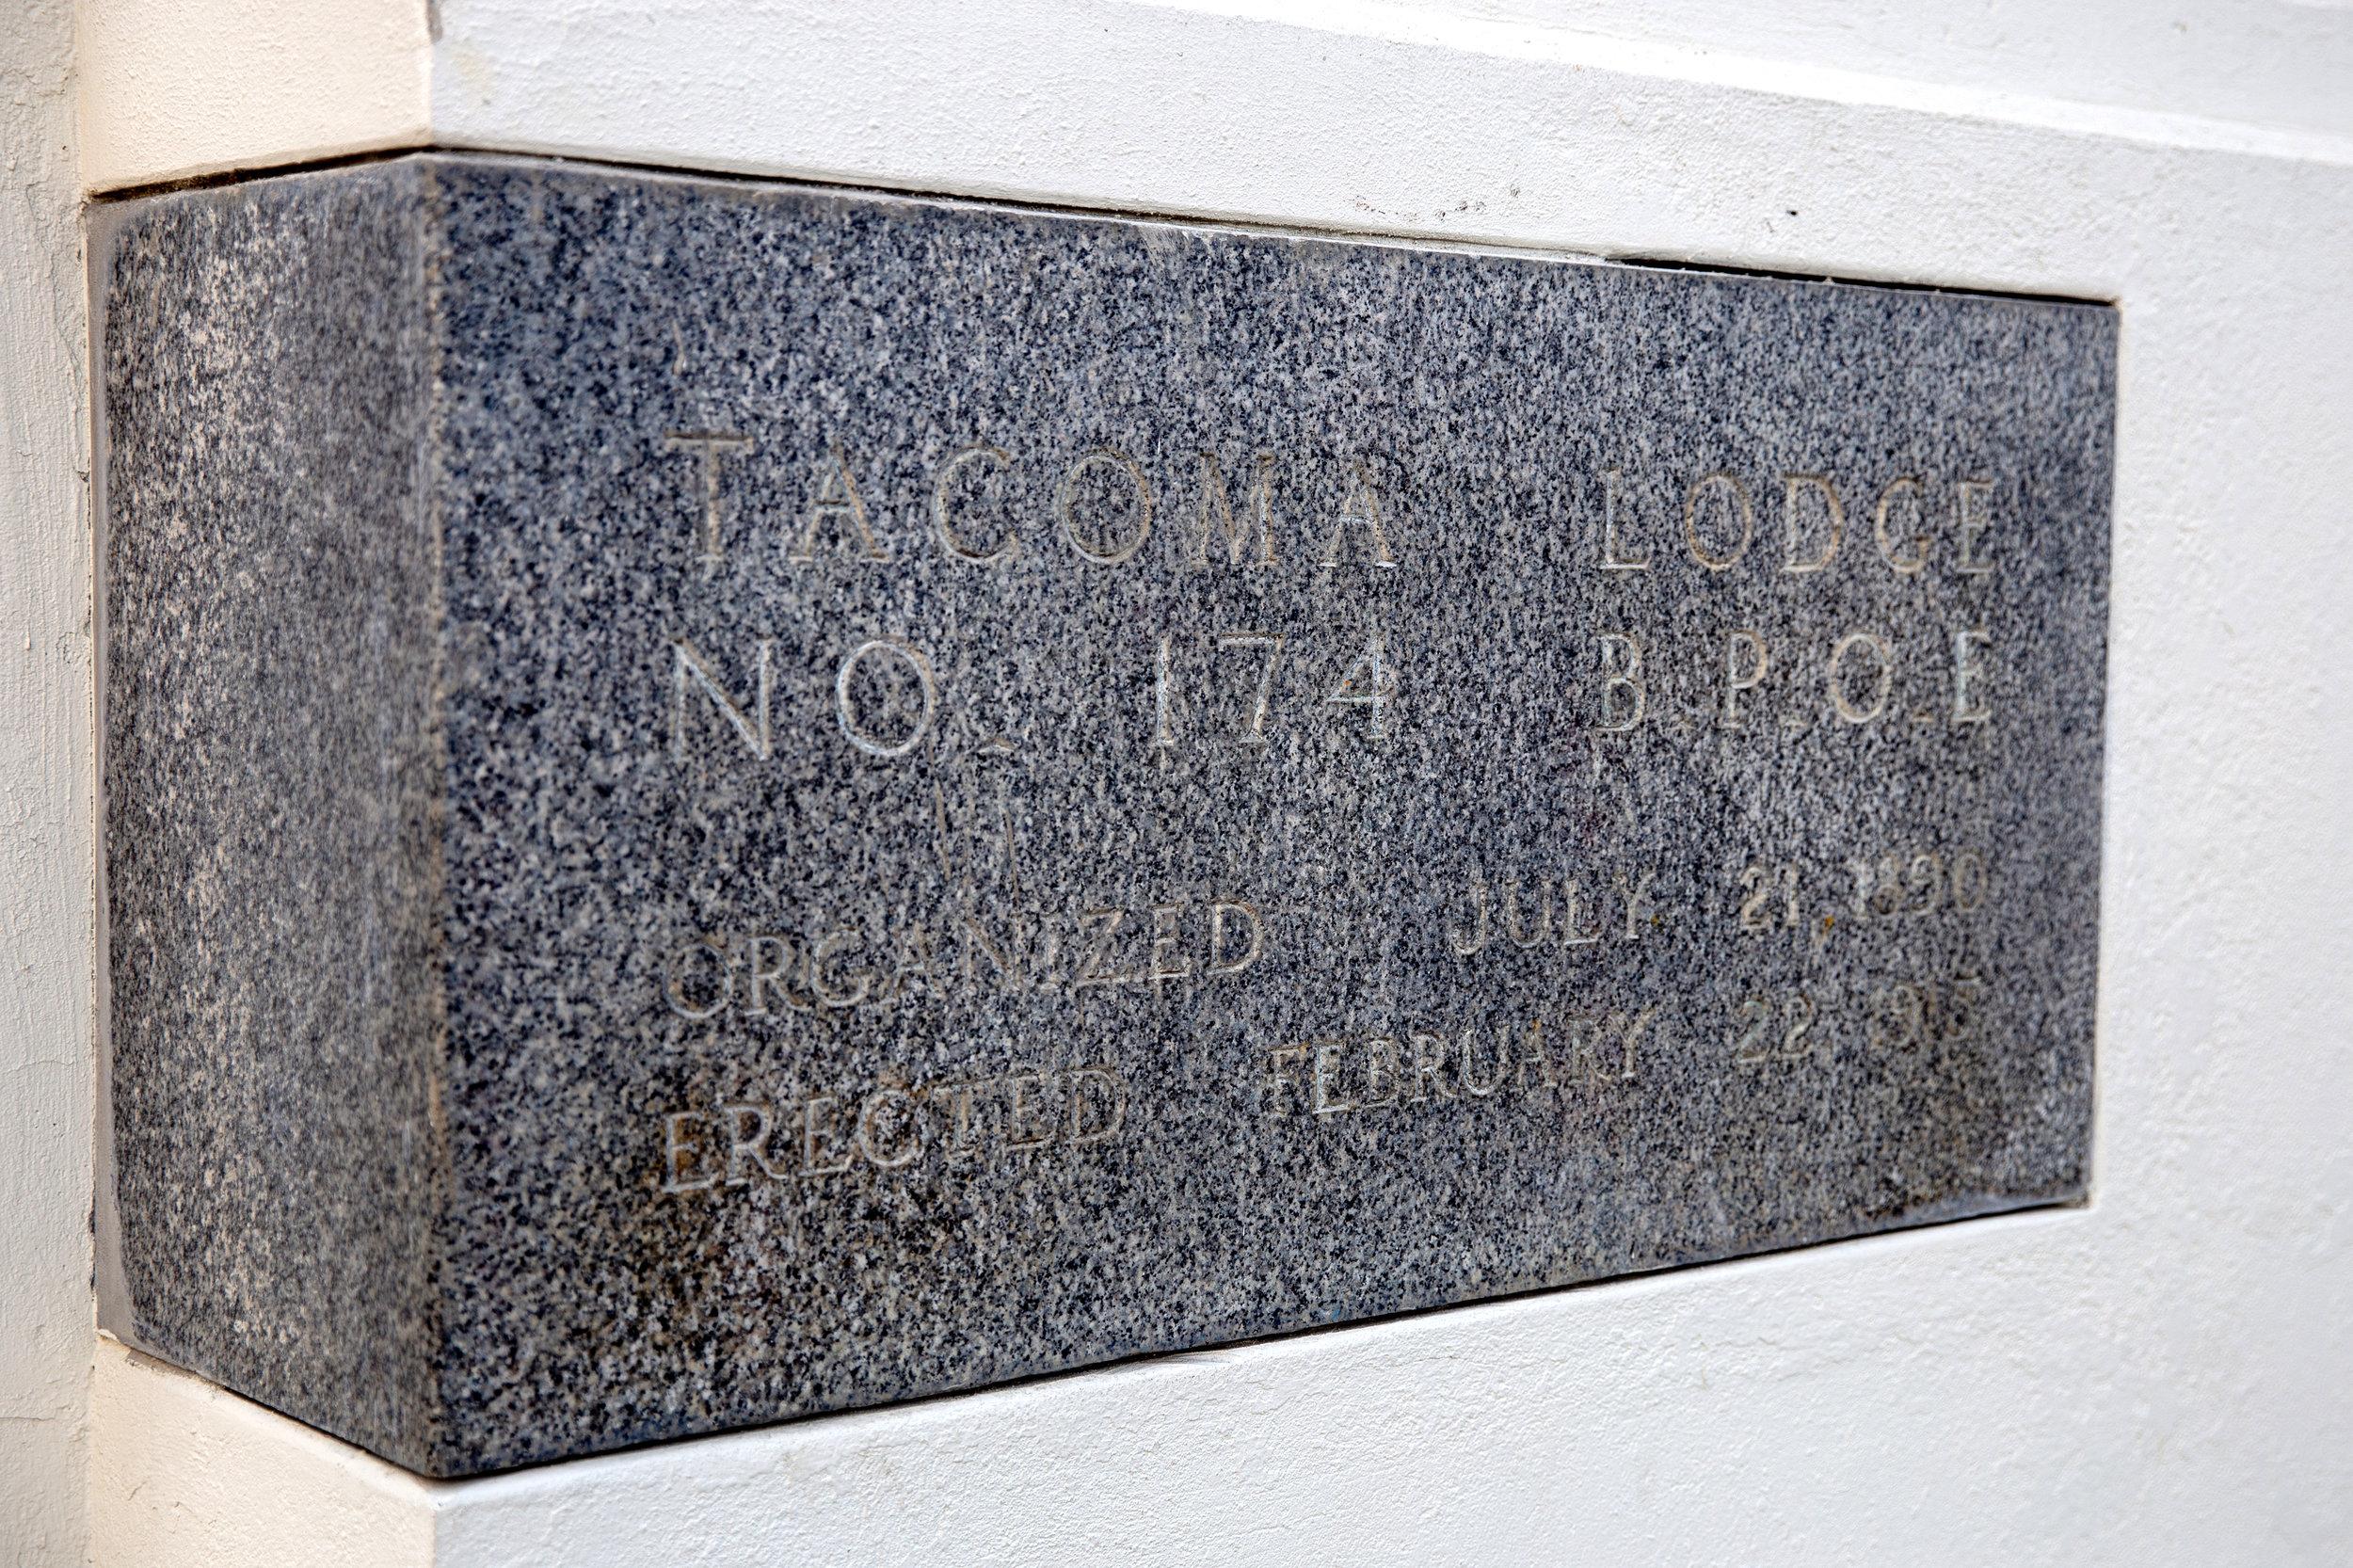 Original cornerstone for the Elks temple